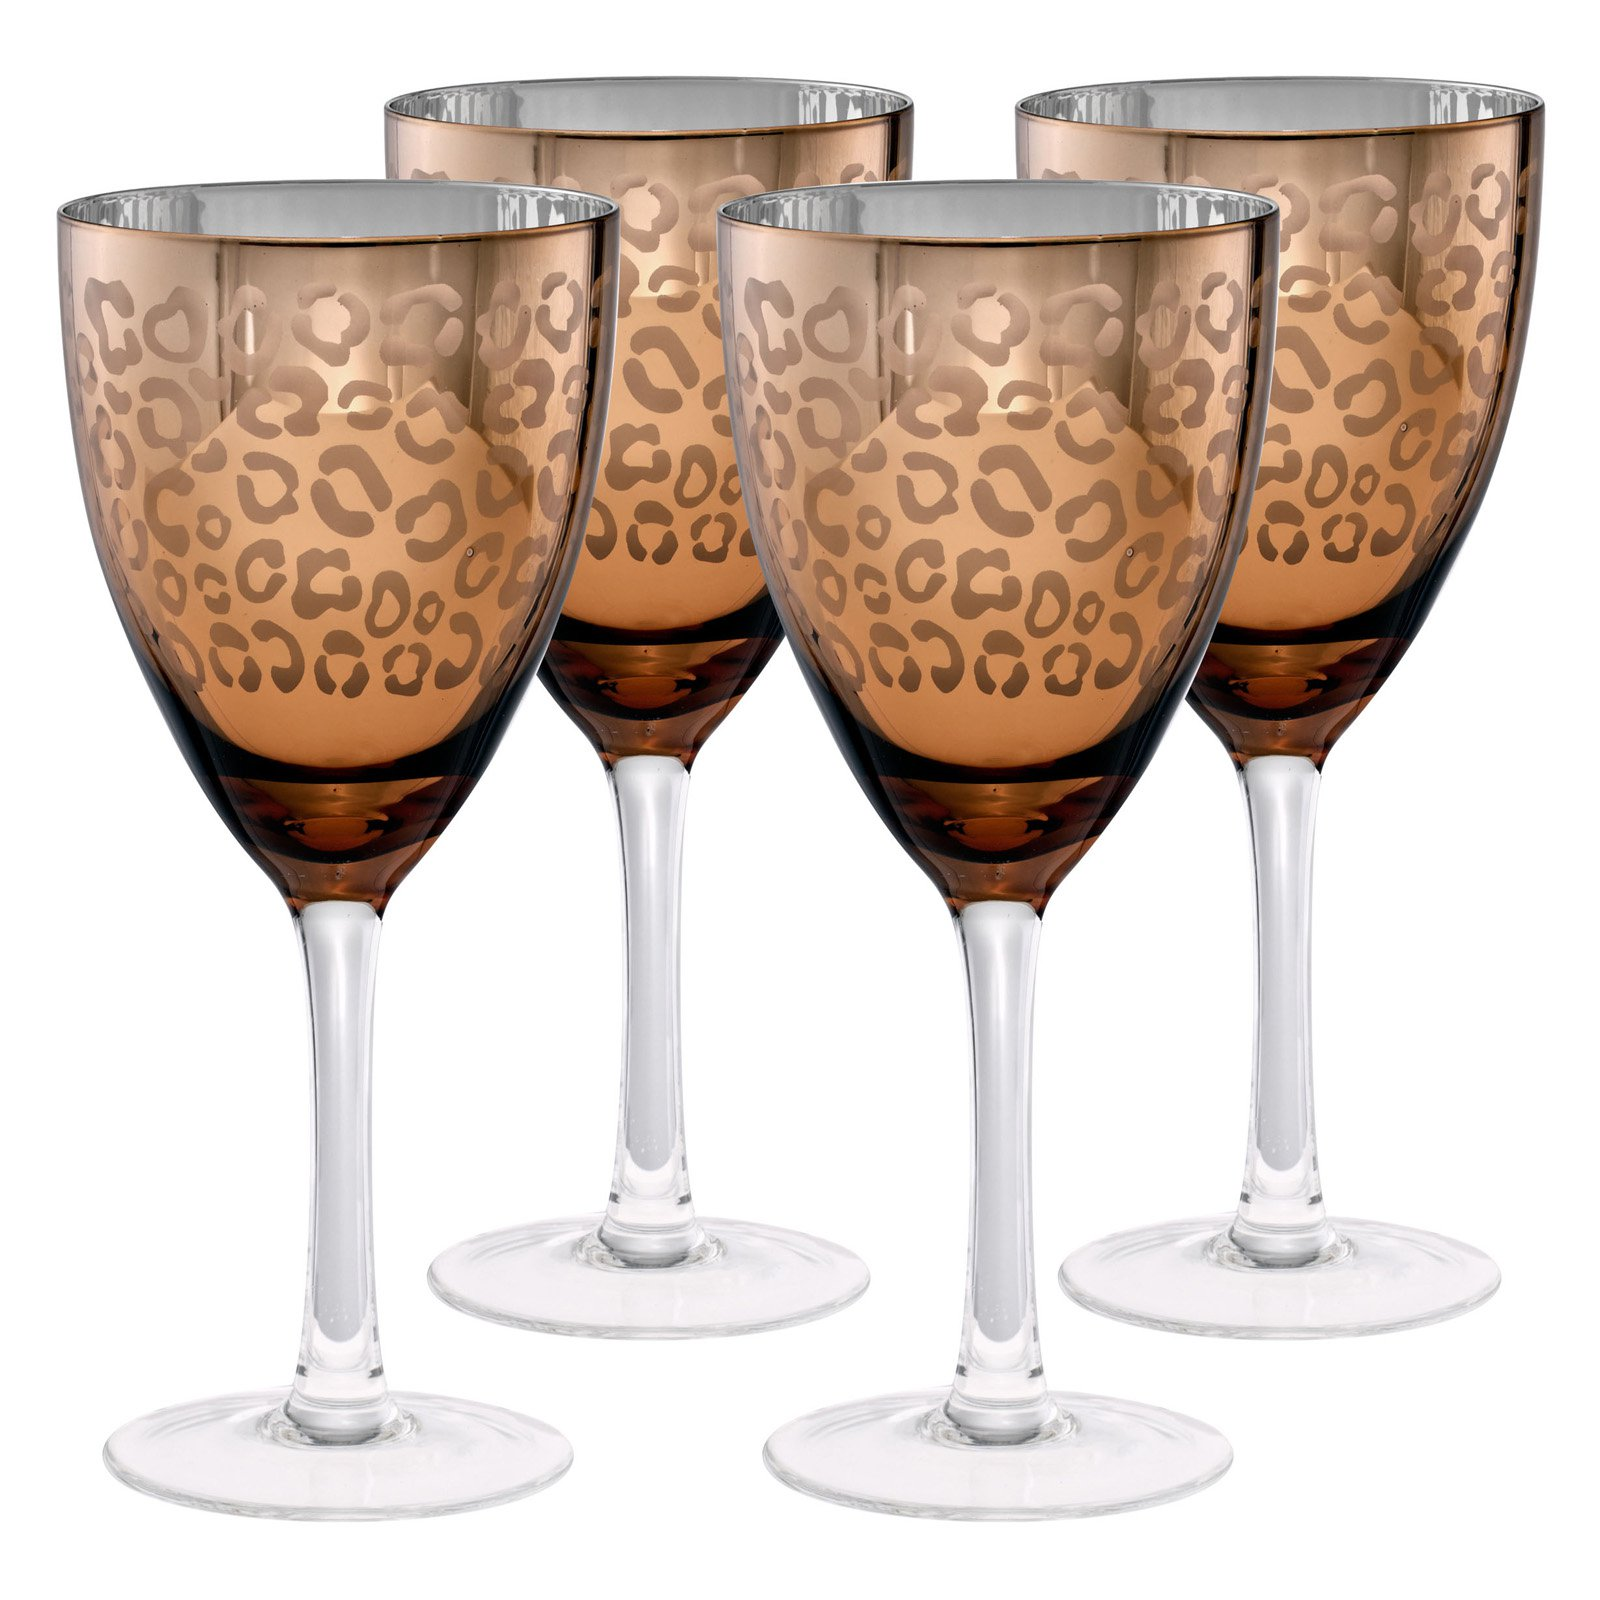 Artland Inc. Leopard Gold Wine Glasses Set of 4 by Artland